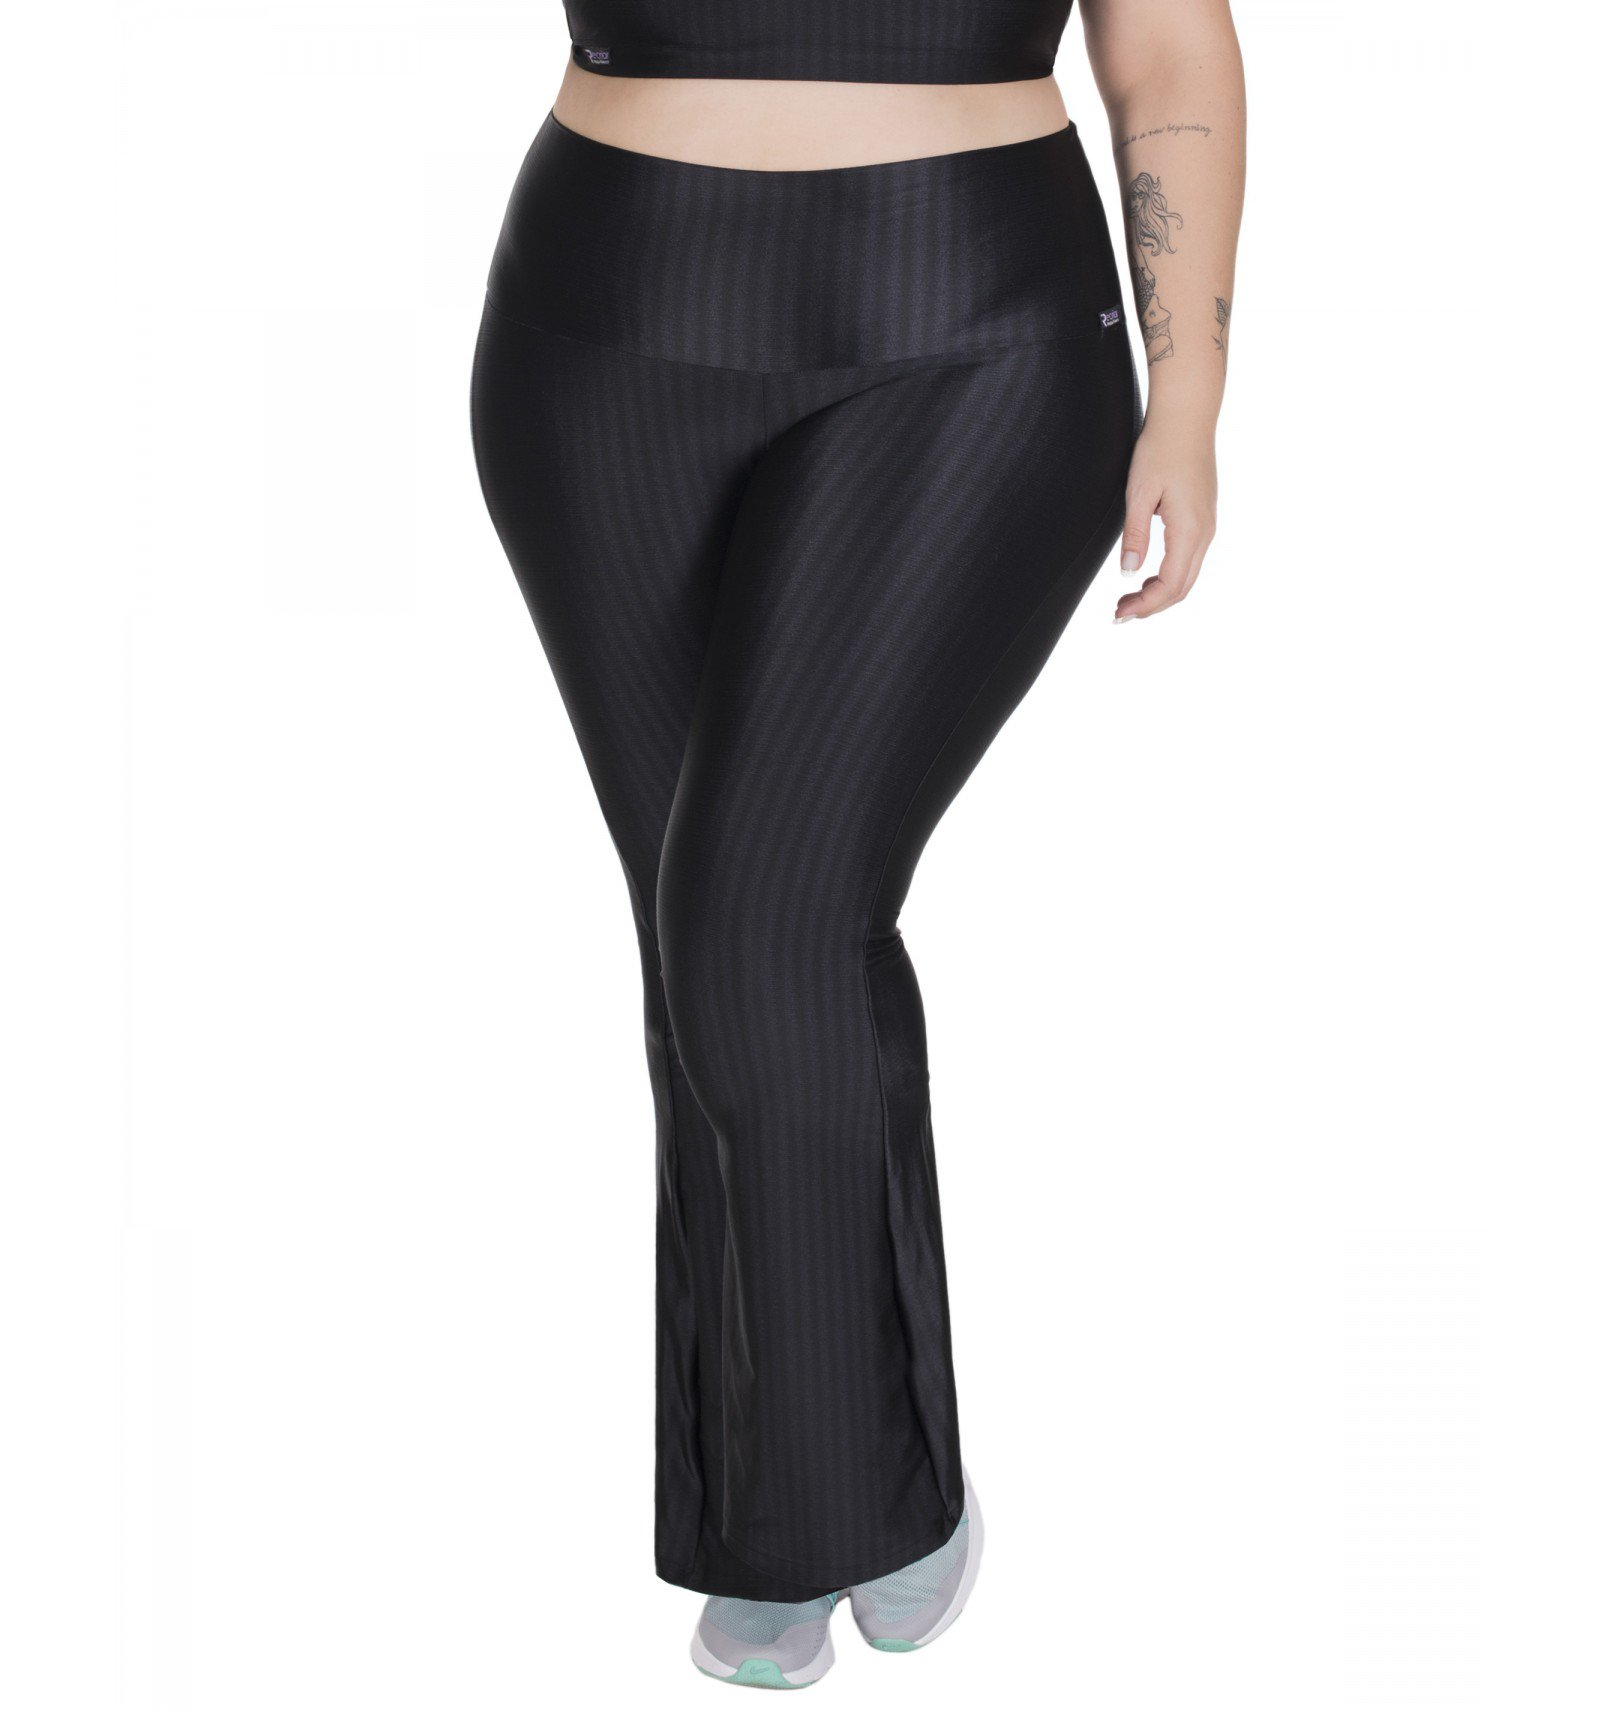 calca-flare-fitness-plus-size-manu-ikat-preta-3d